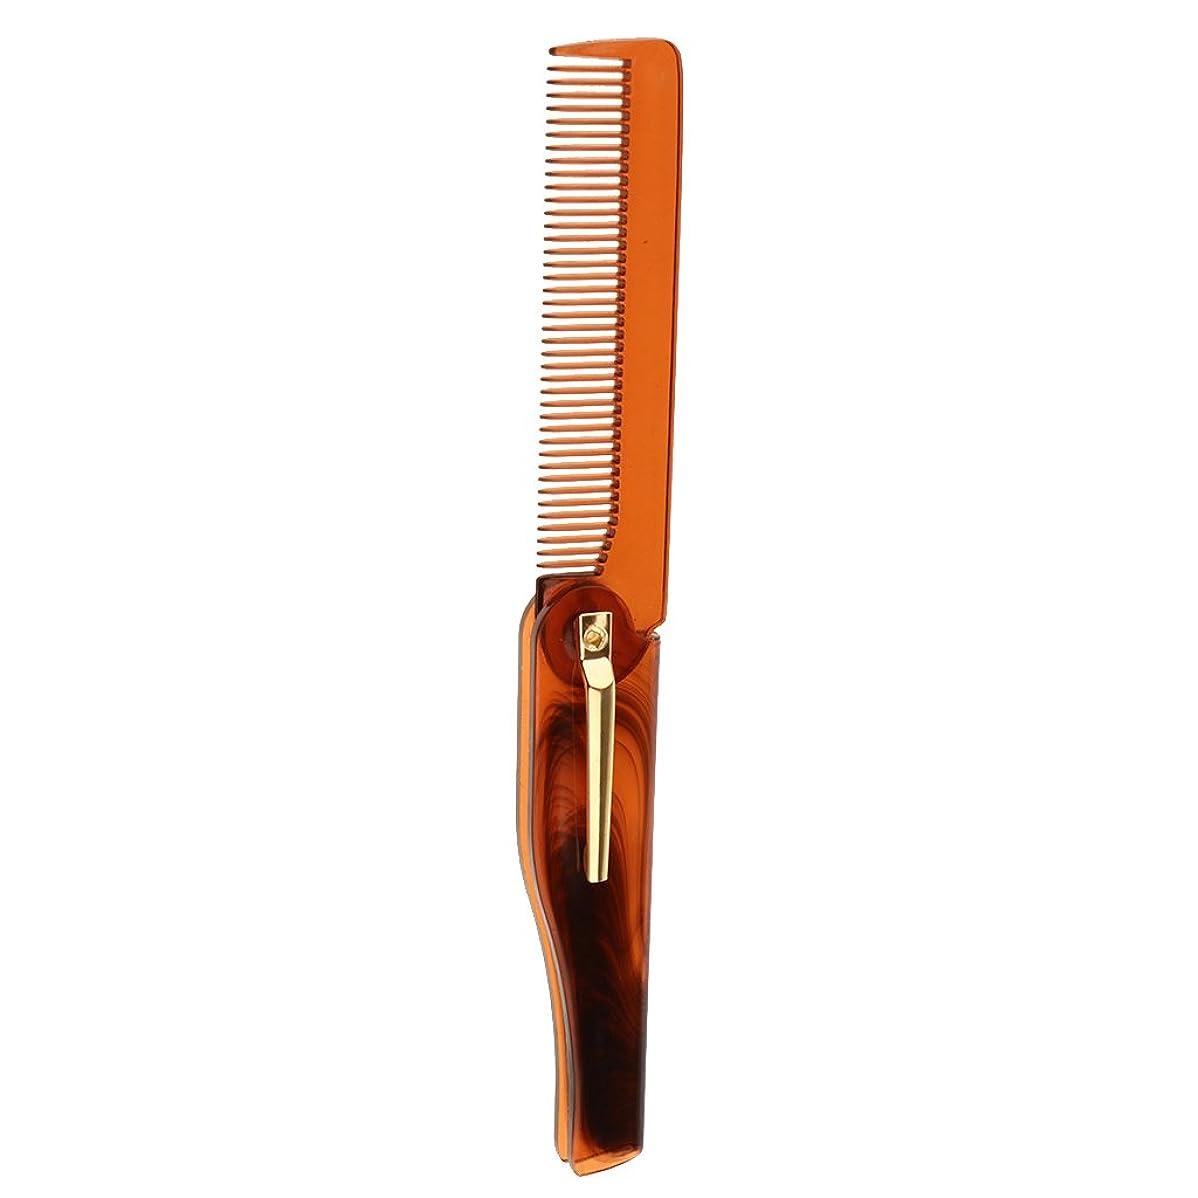 DYNWAVE メンズ 口ひげ&あごひげ ひげひげ剃り櫛 シェイプシェイプ 髭のブラシ 折りたたみ 携帯便利 全2色 - グレー